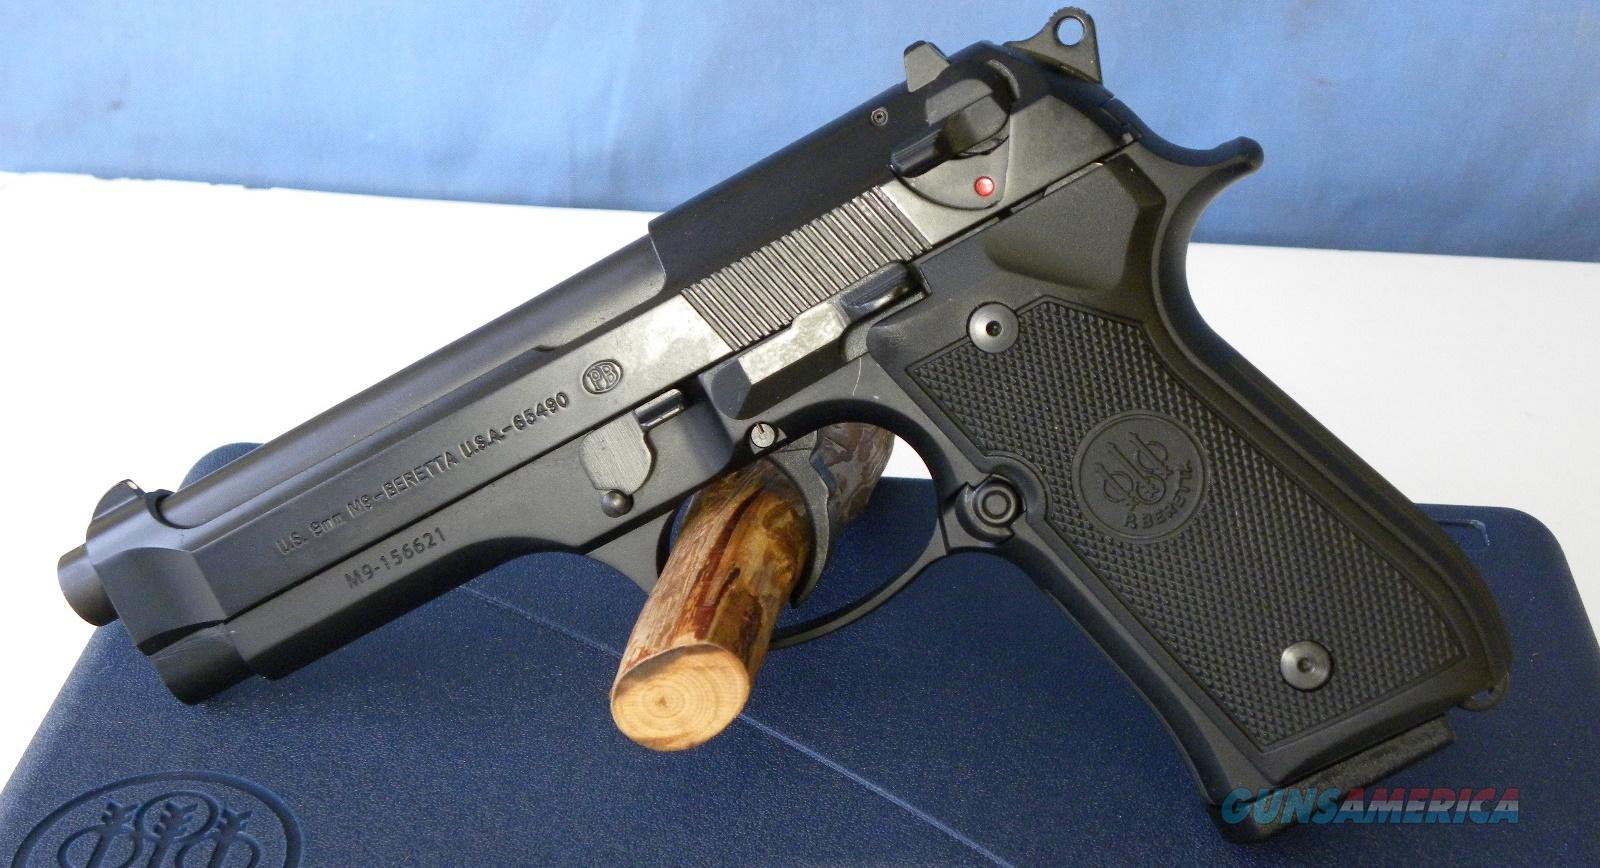 Beretta M9 9mm for sale